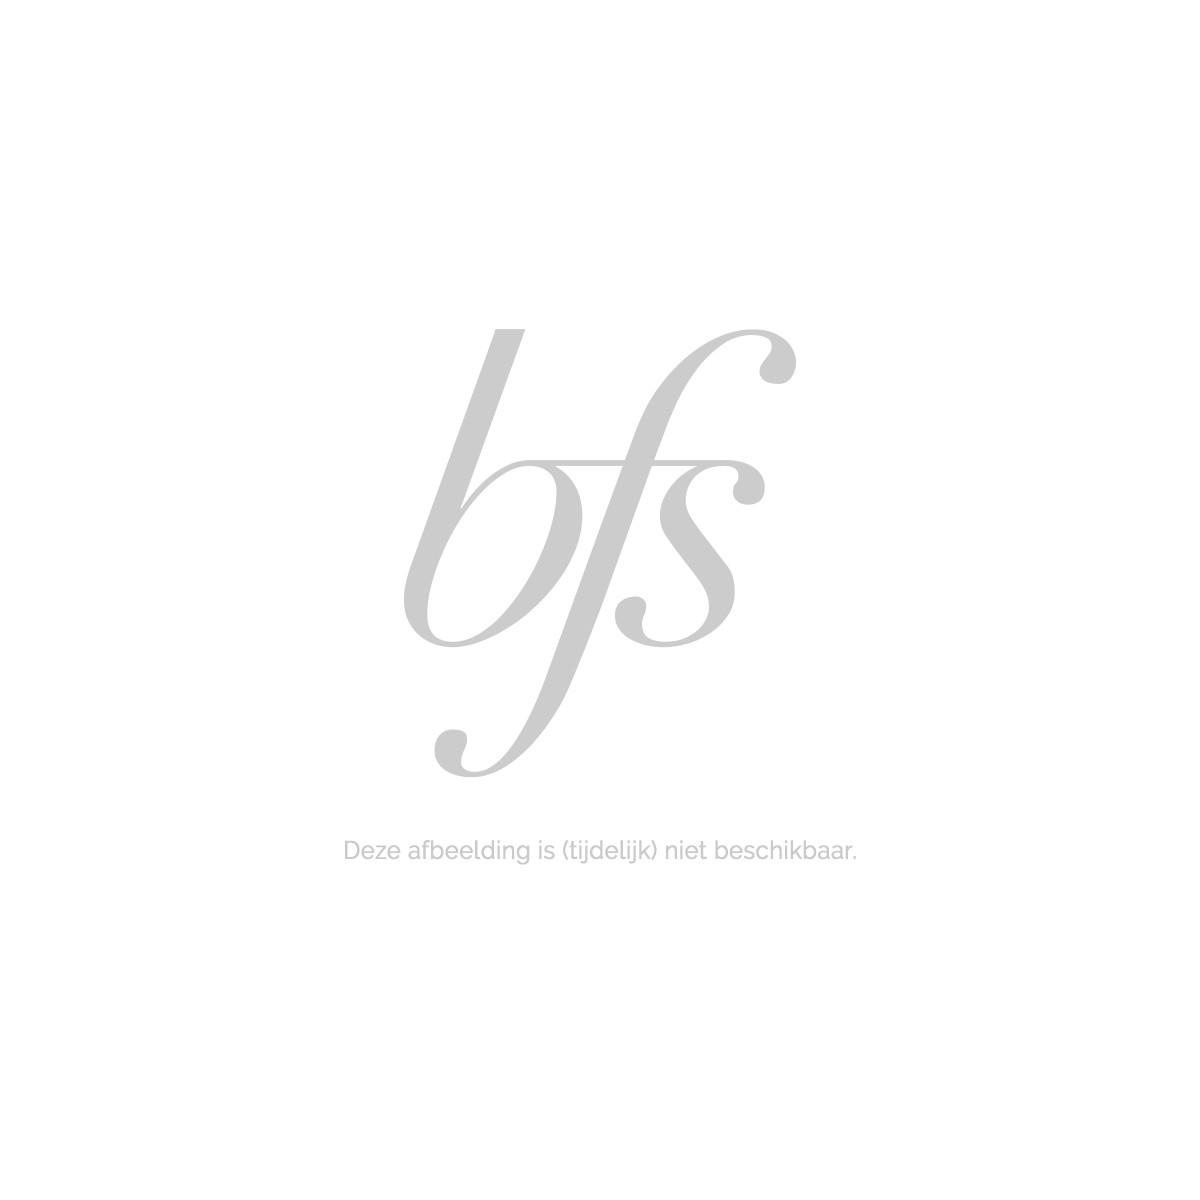 Chanel Coco Mademoiselle edt refillable spray Eau de Toilette 50 ml